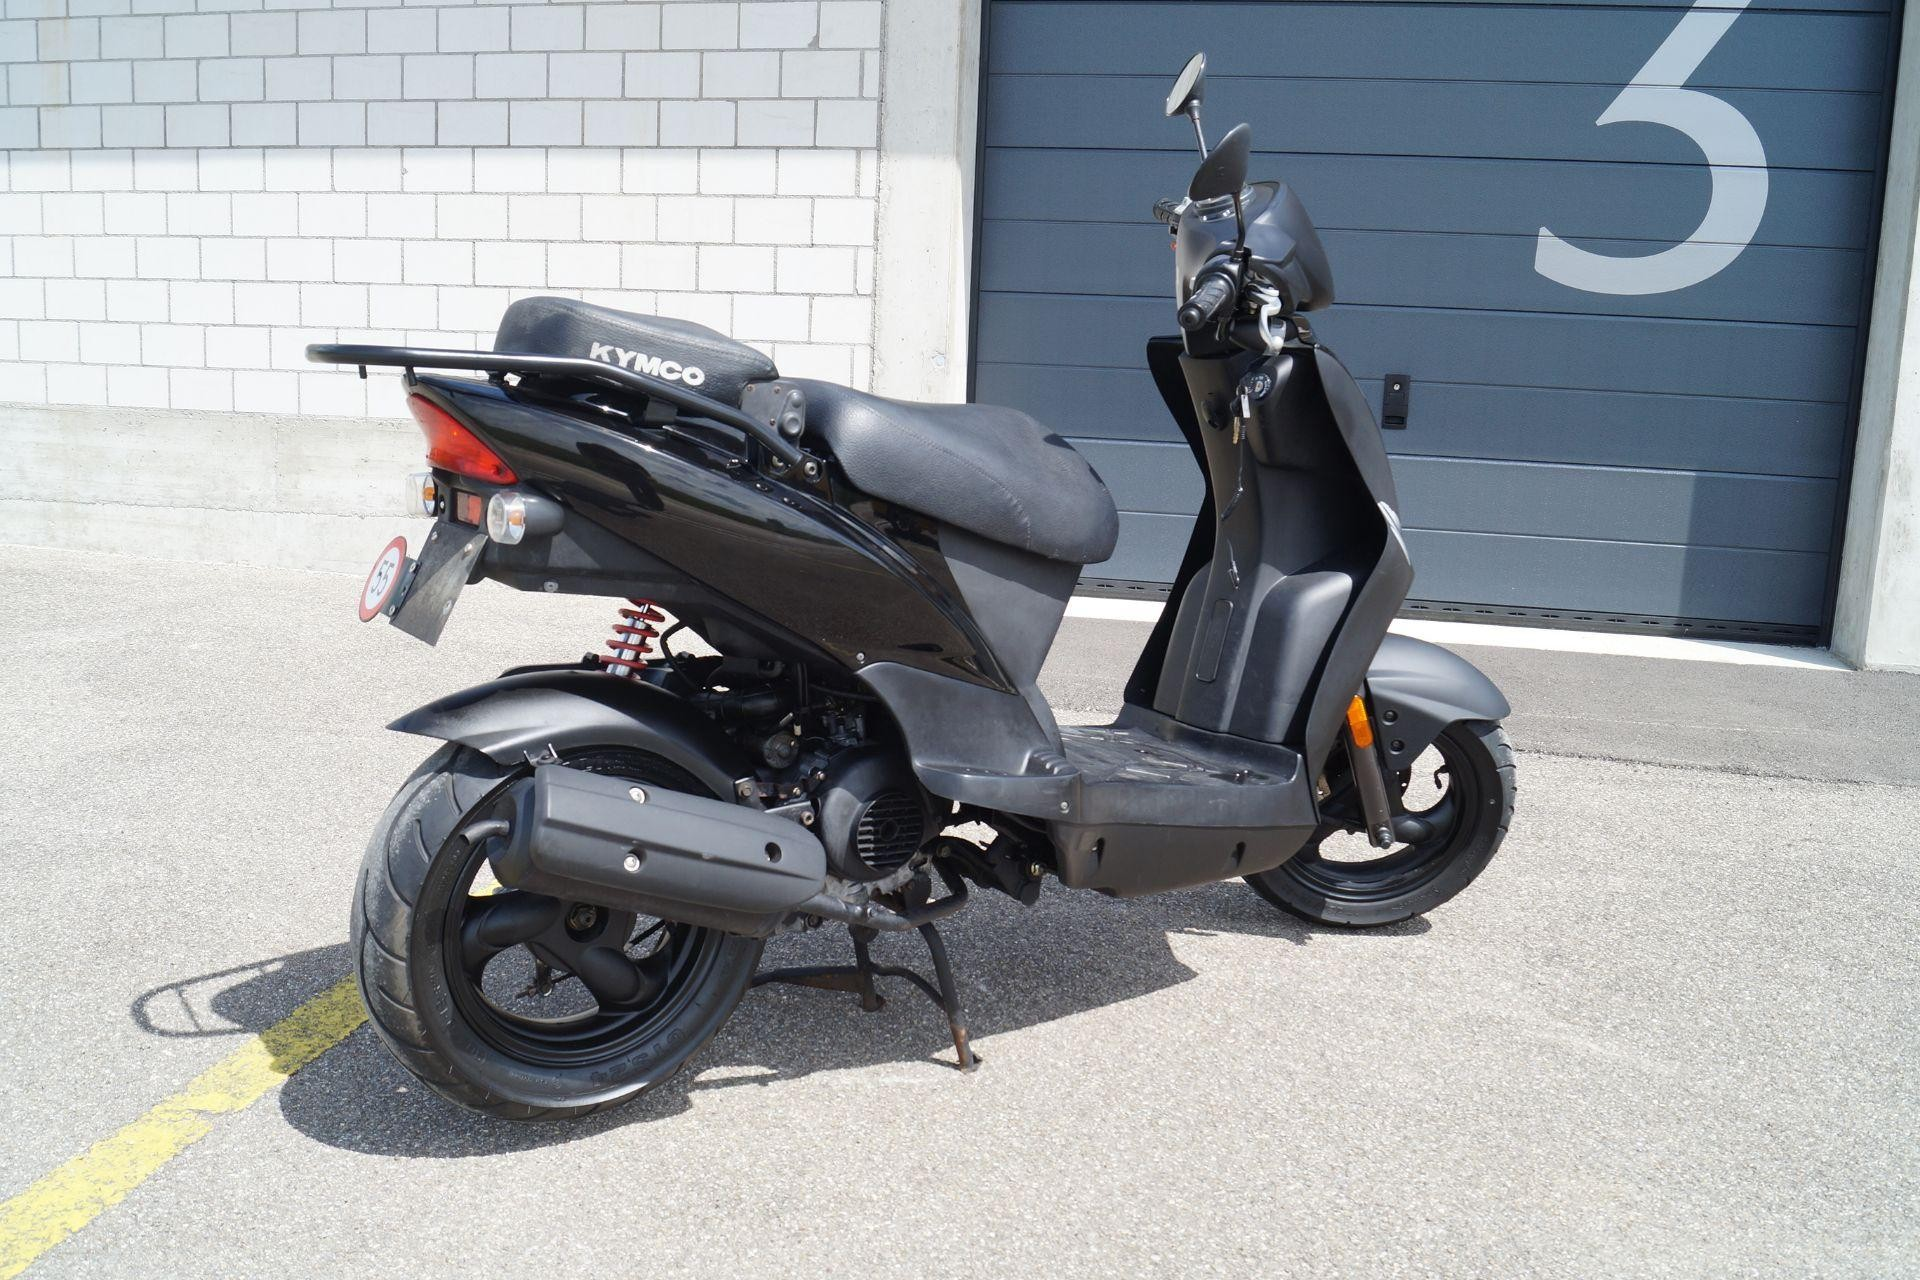 motorrad occasion kaufen kymco agility 50 motoshop ziegler. Black Bedroom Furniture Sets. Home Design Ideas